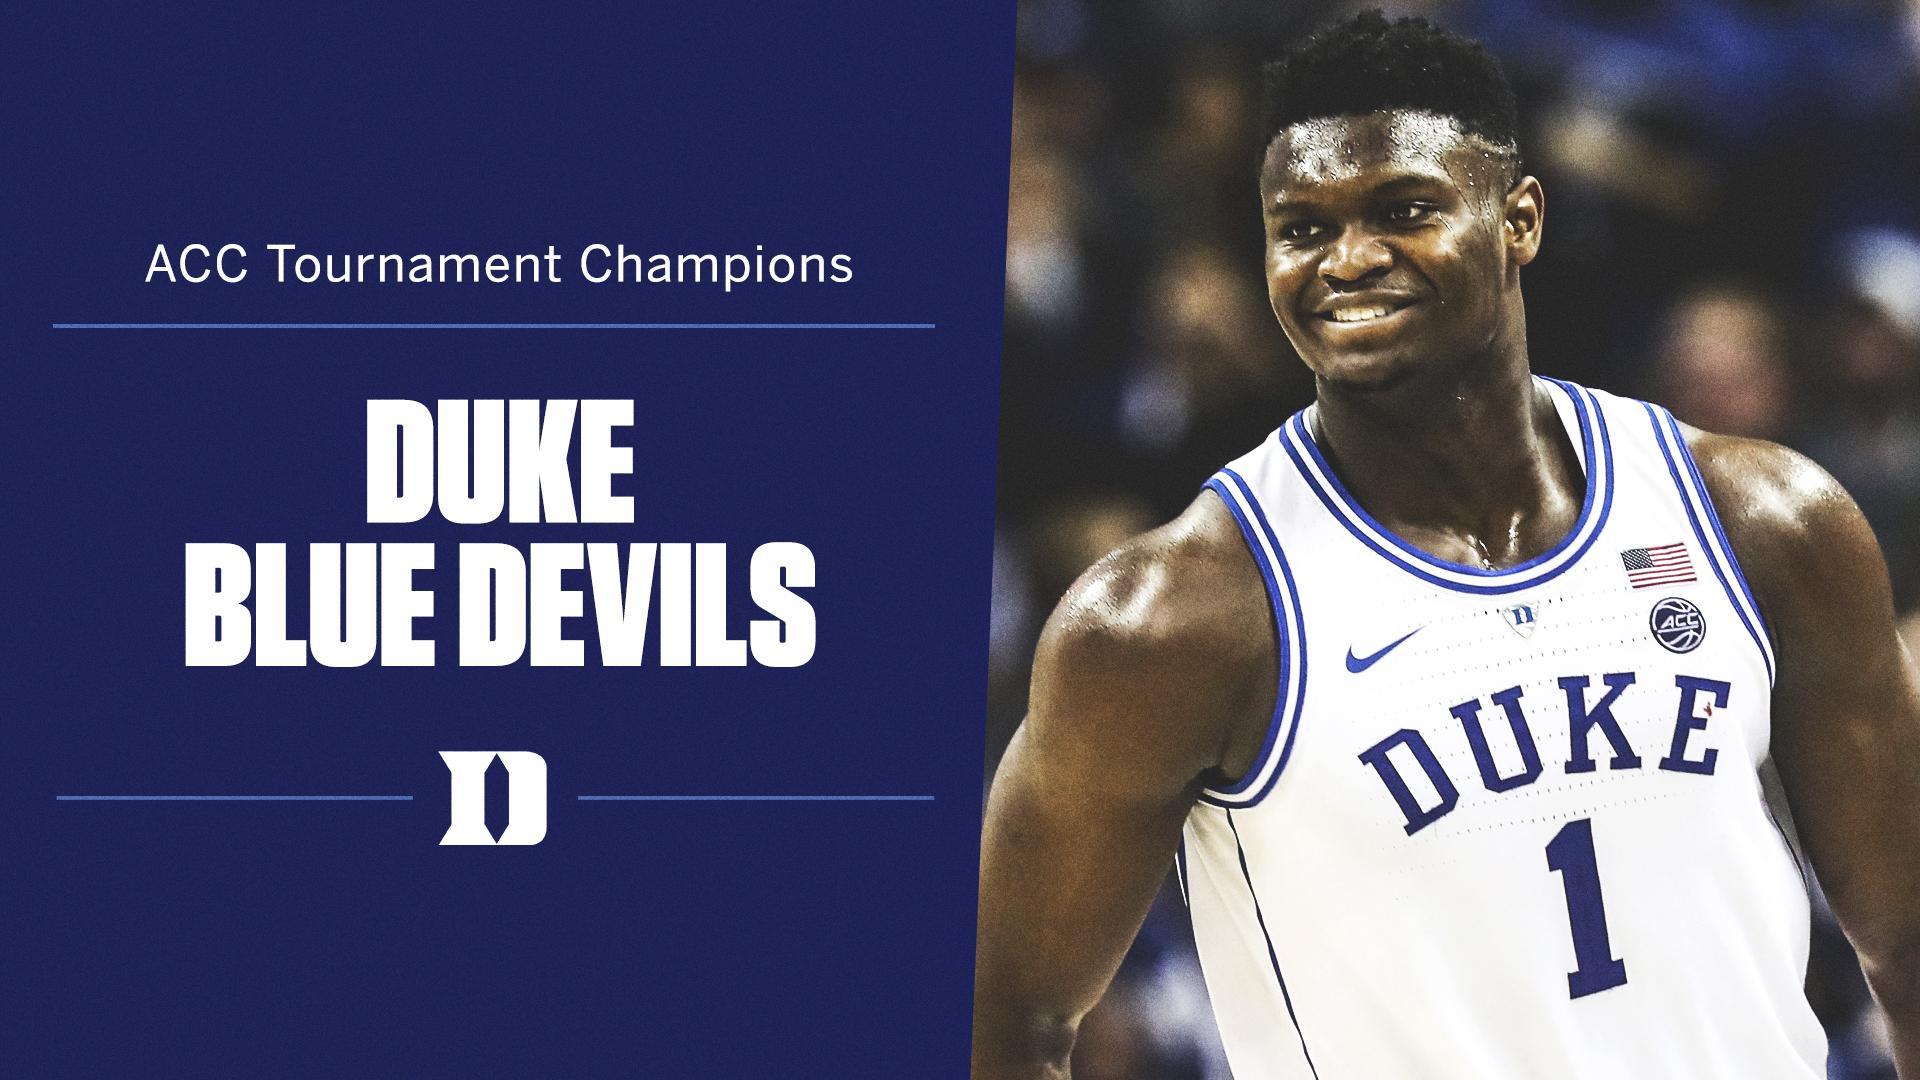 Duke makes a statement for No. 1 overall �� https://t.co/goKaRahhI1